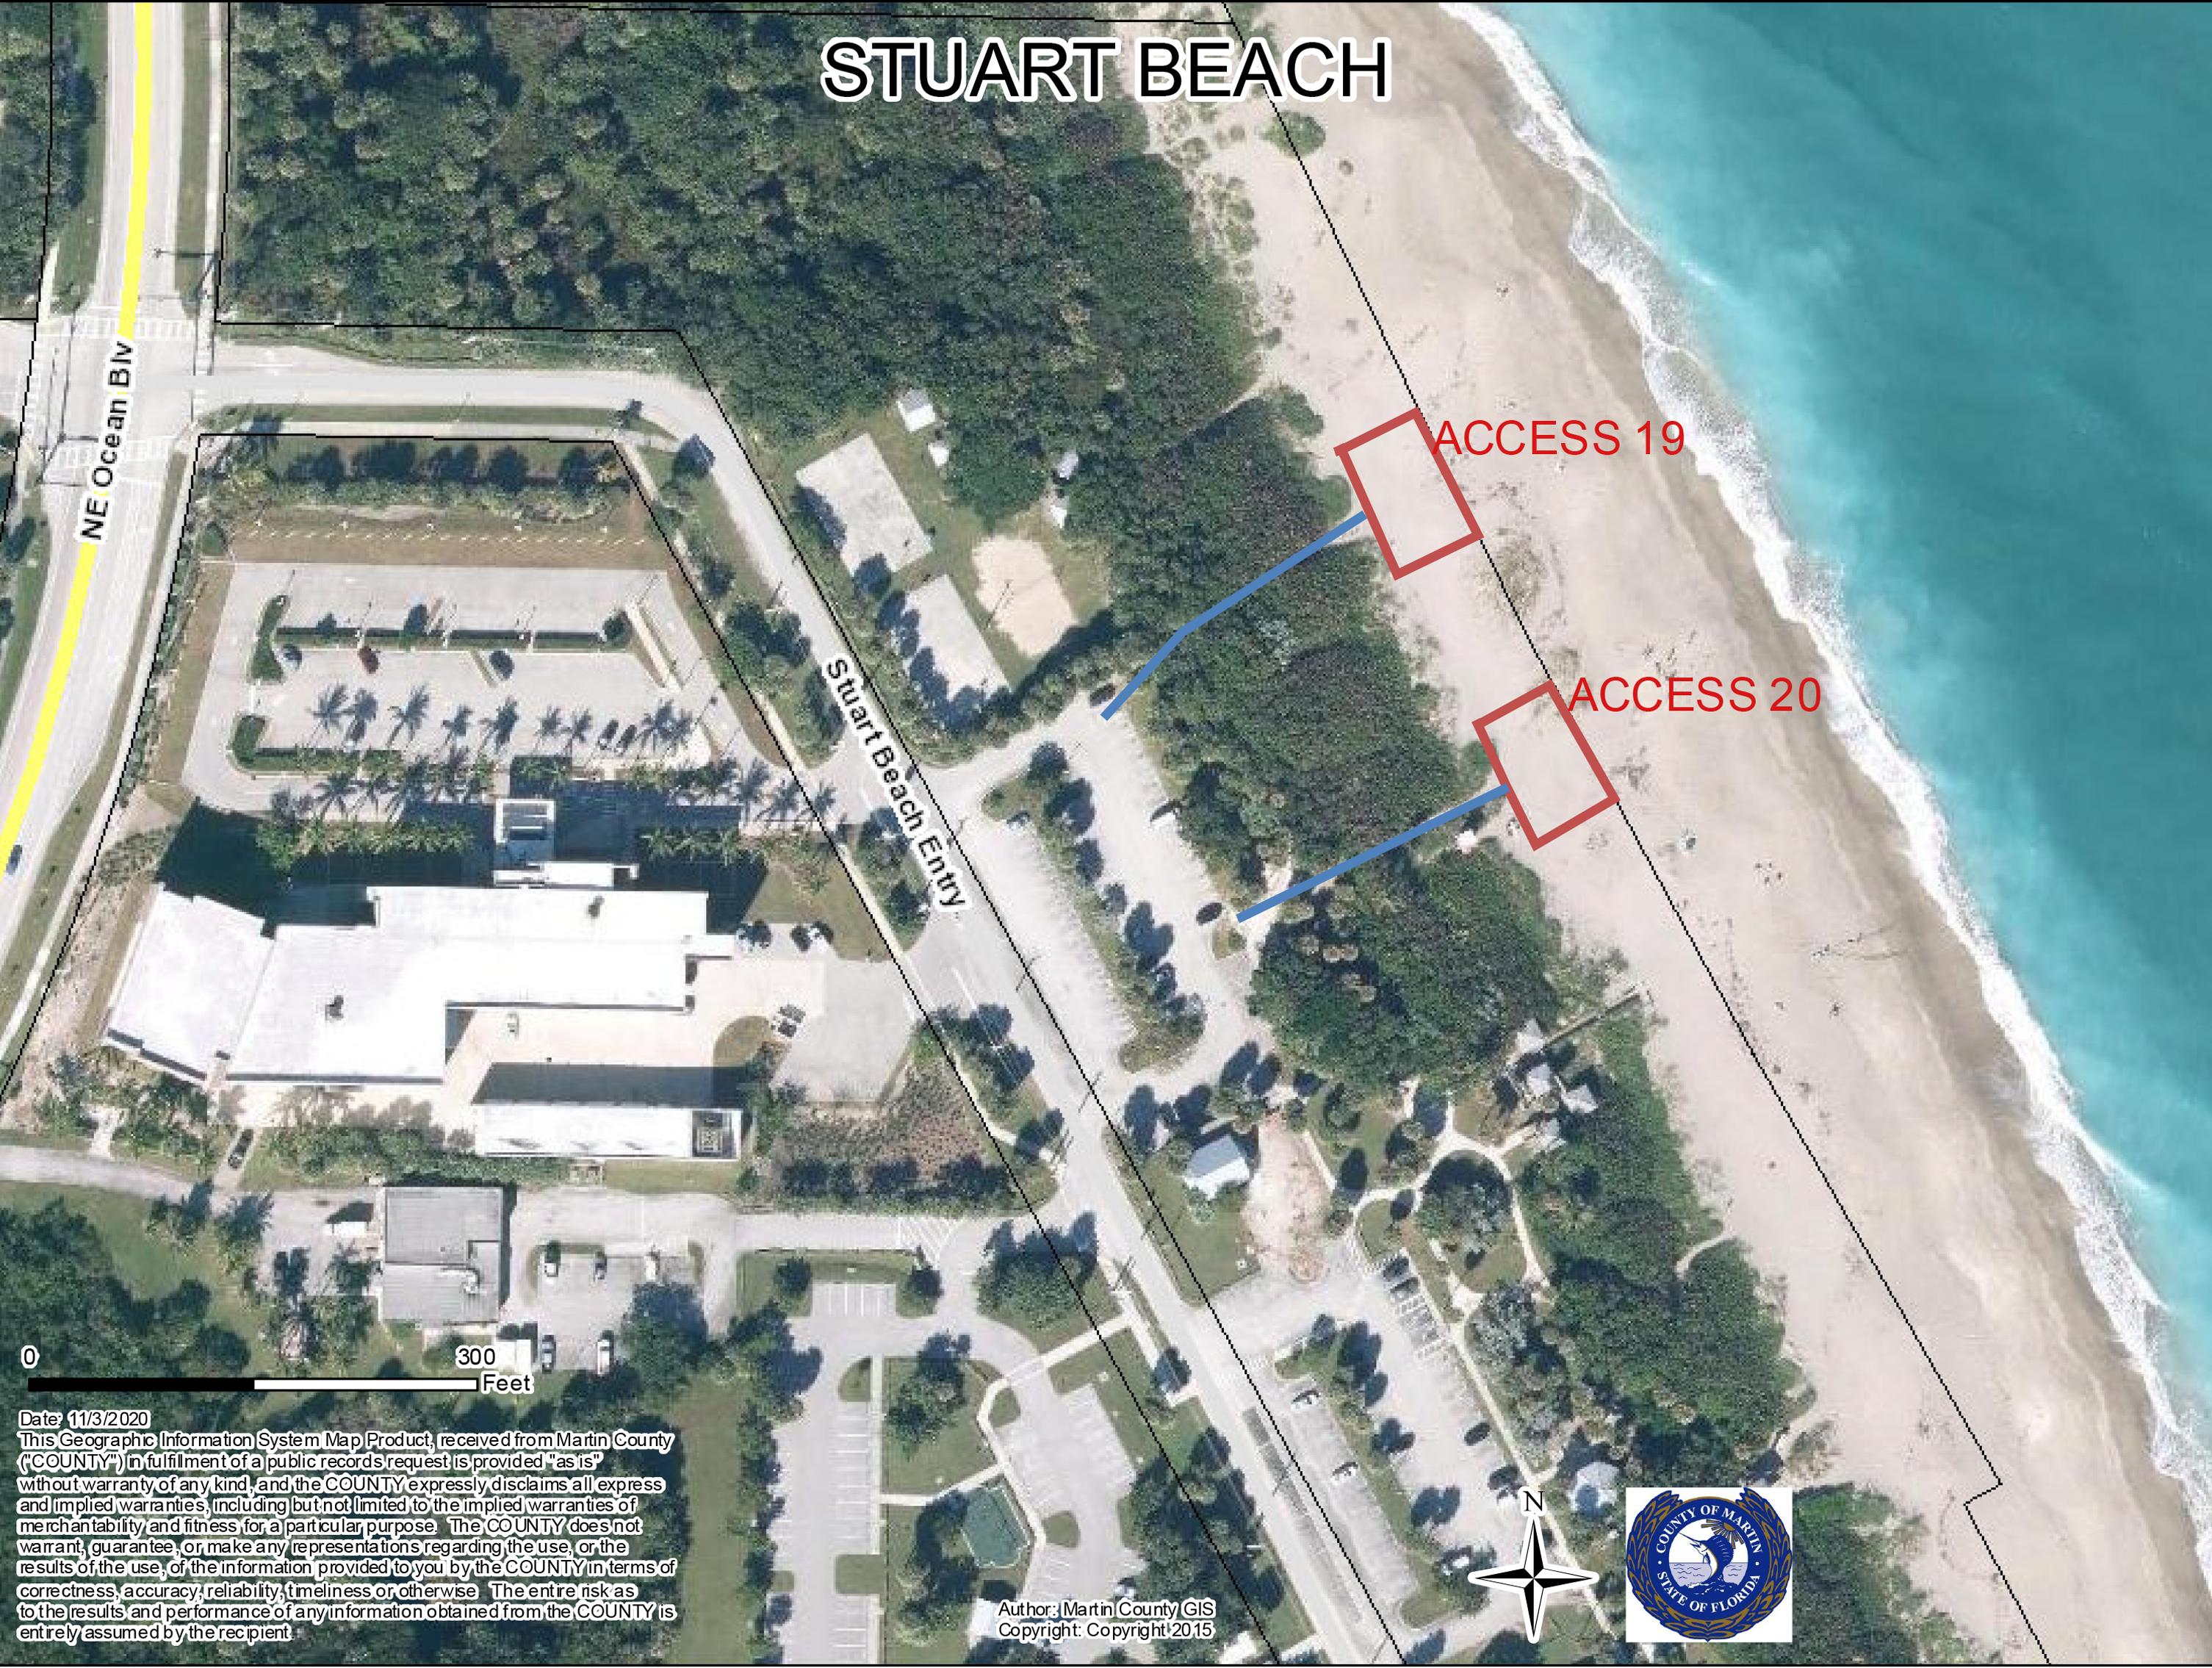 Stuart Beach fire Pit Locations